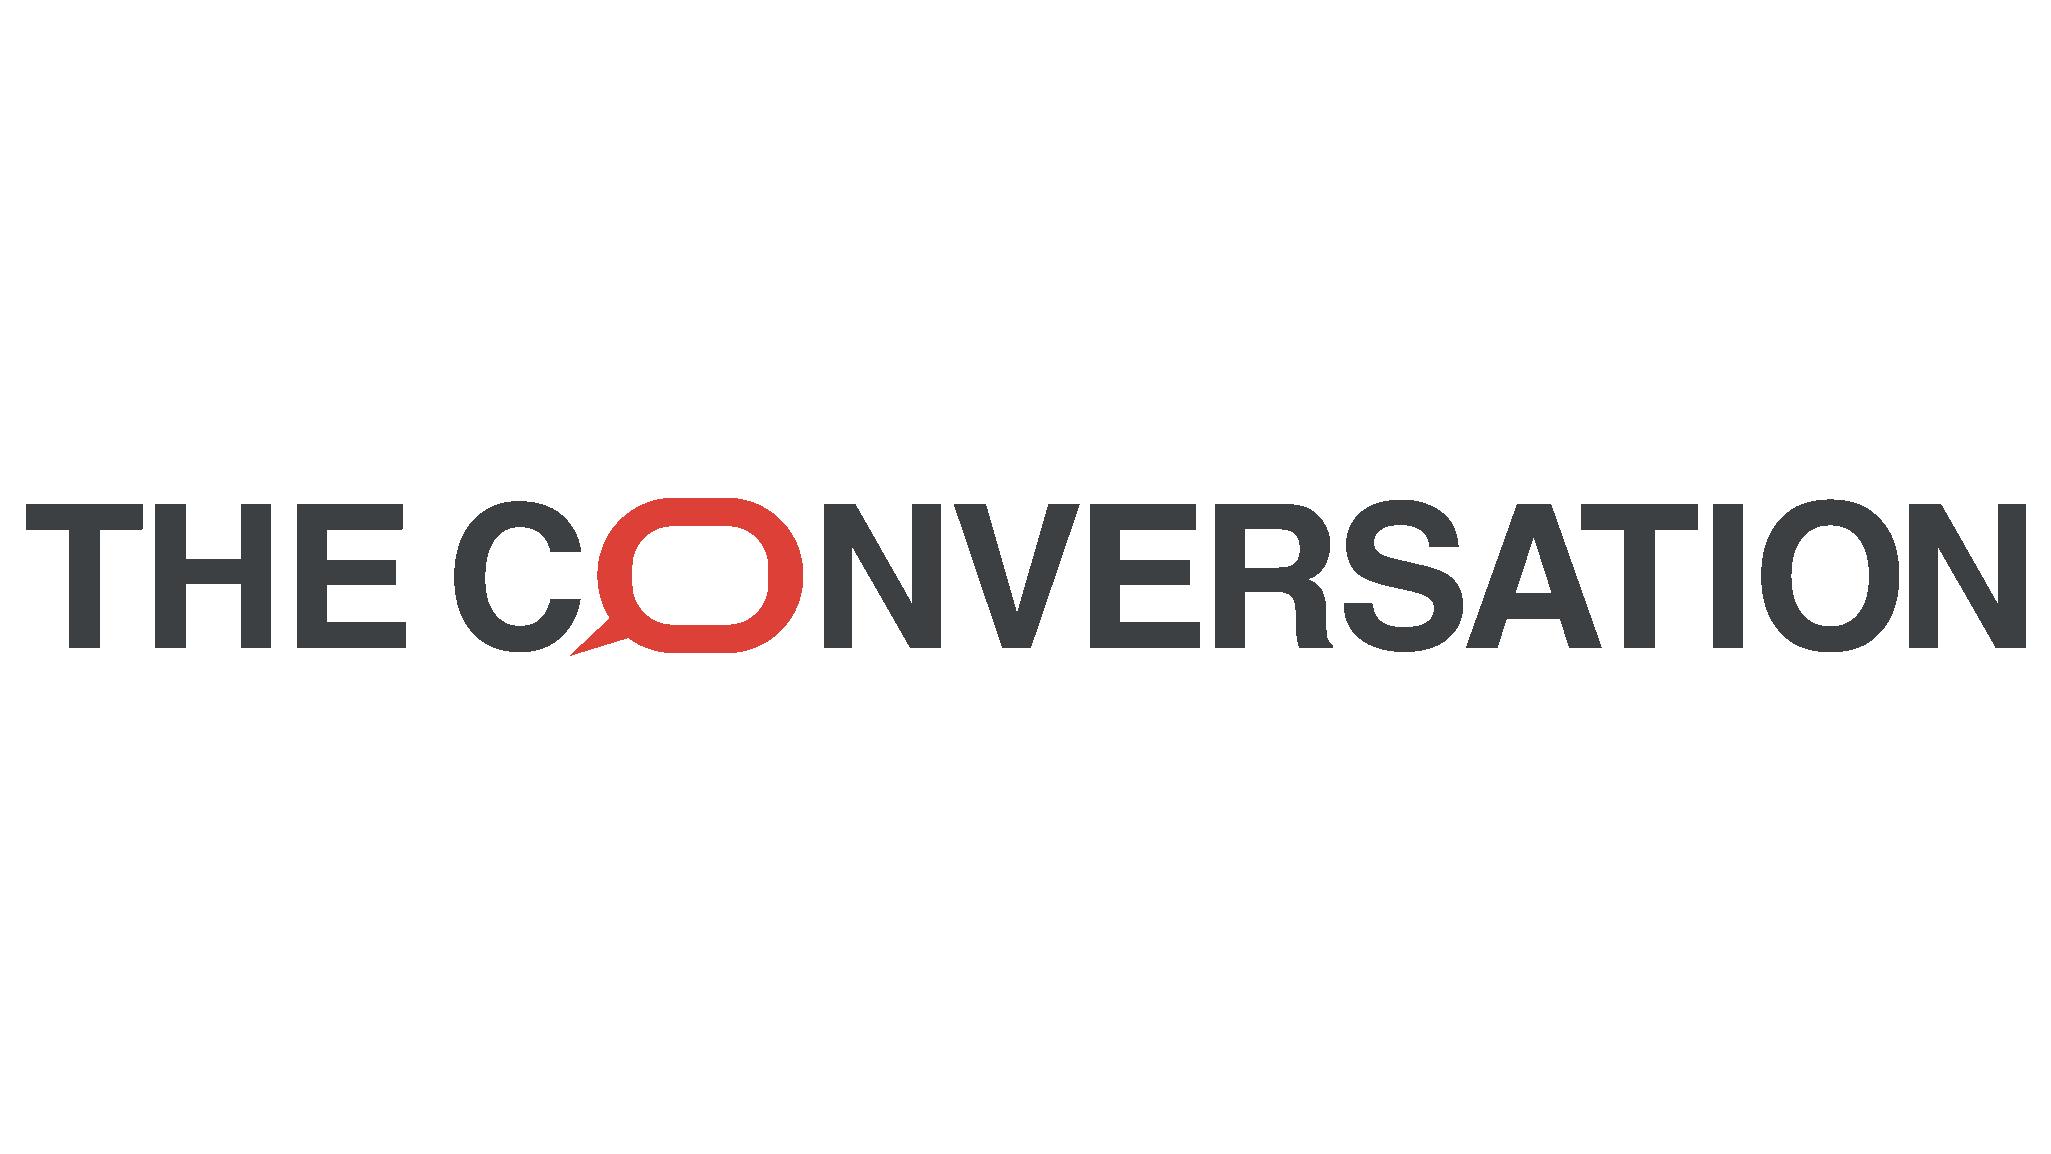 38 The-Conversation.jpg